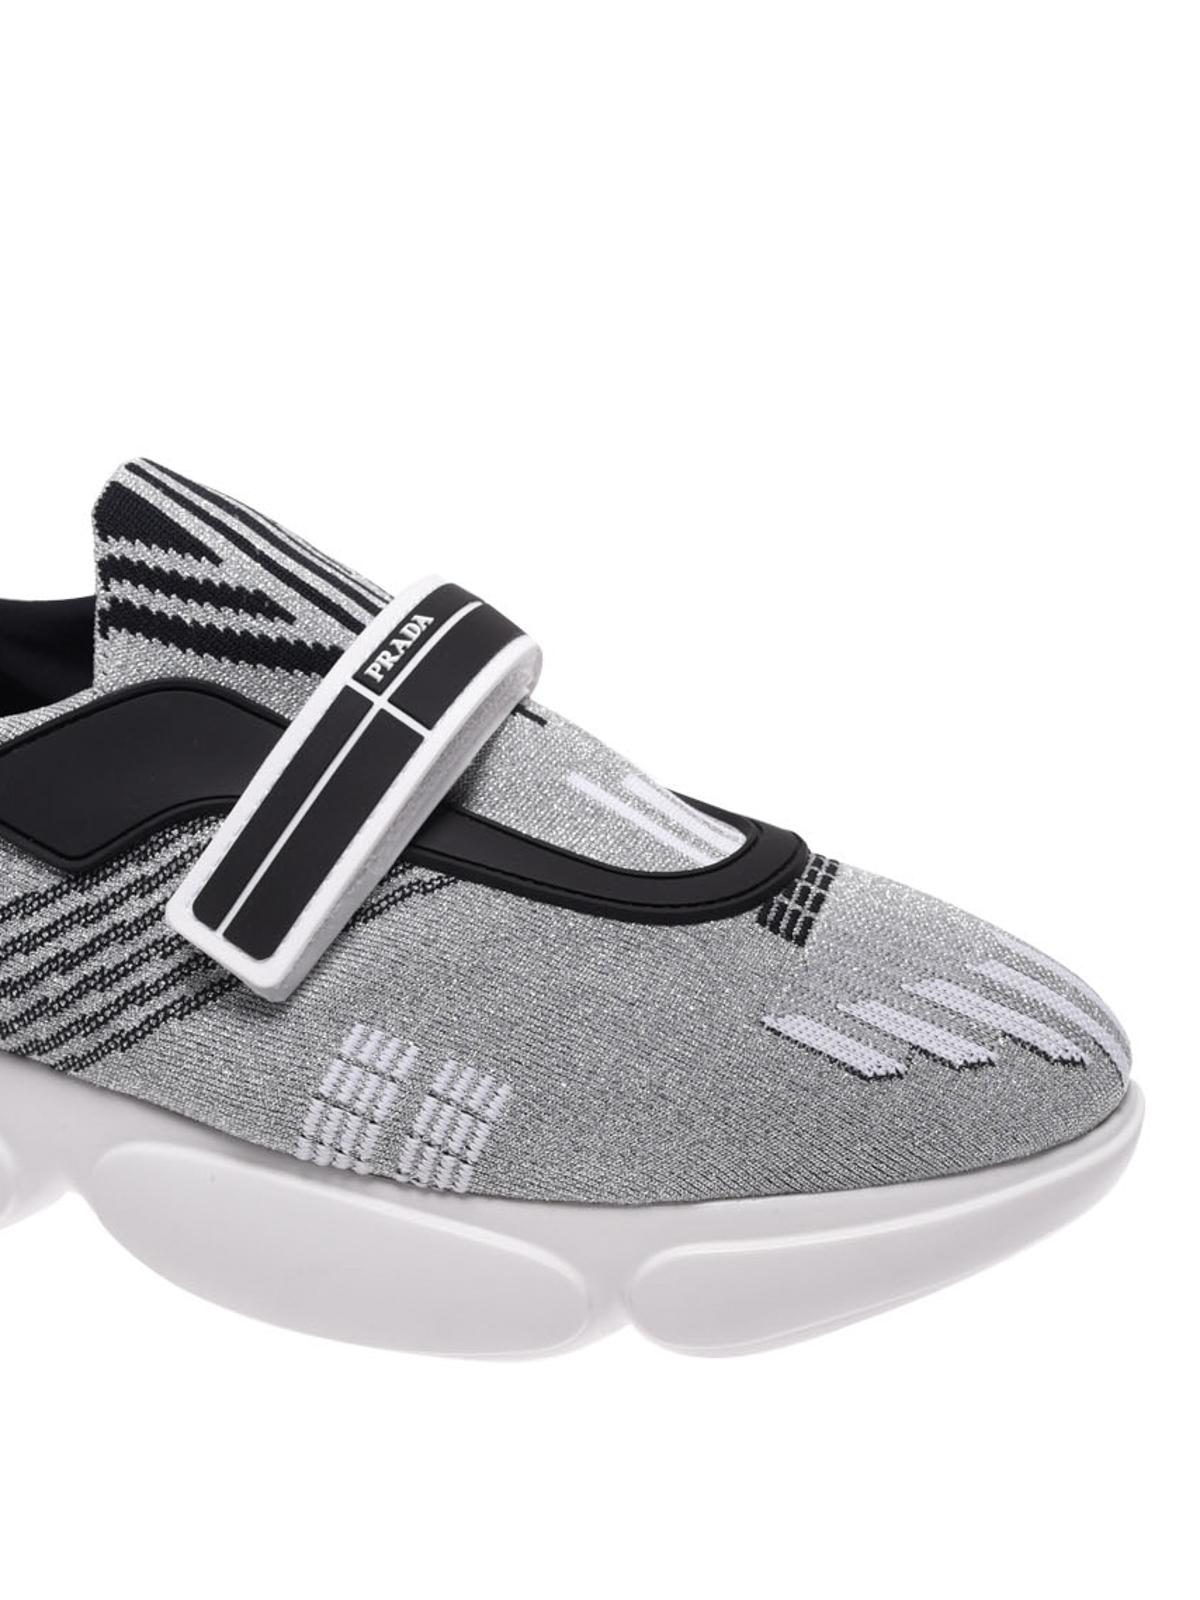 Prada - Silver Cloudburst sneakers